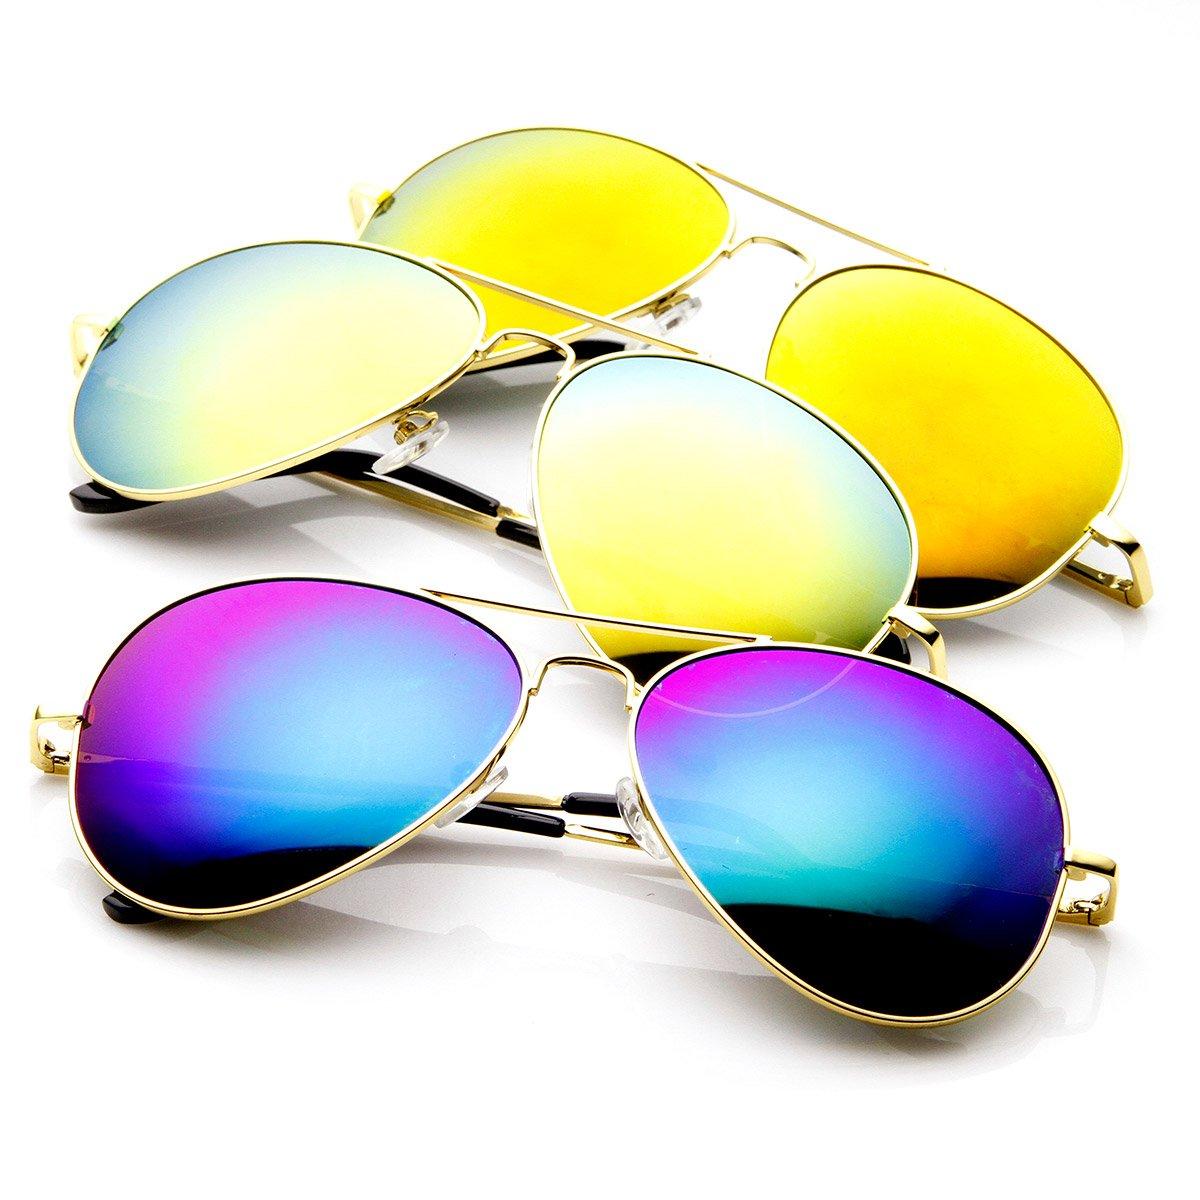 zeroUV - Classic Metal Frame Spring Hinges Color Mirror Lens Aviator Sunglasses 56mm frame&optic 1486